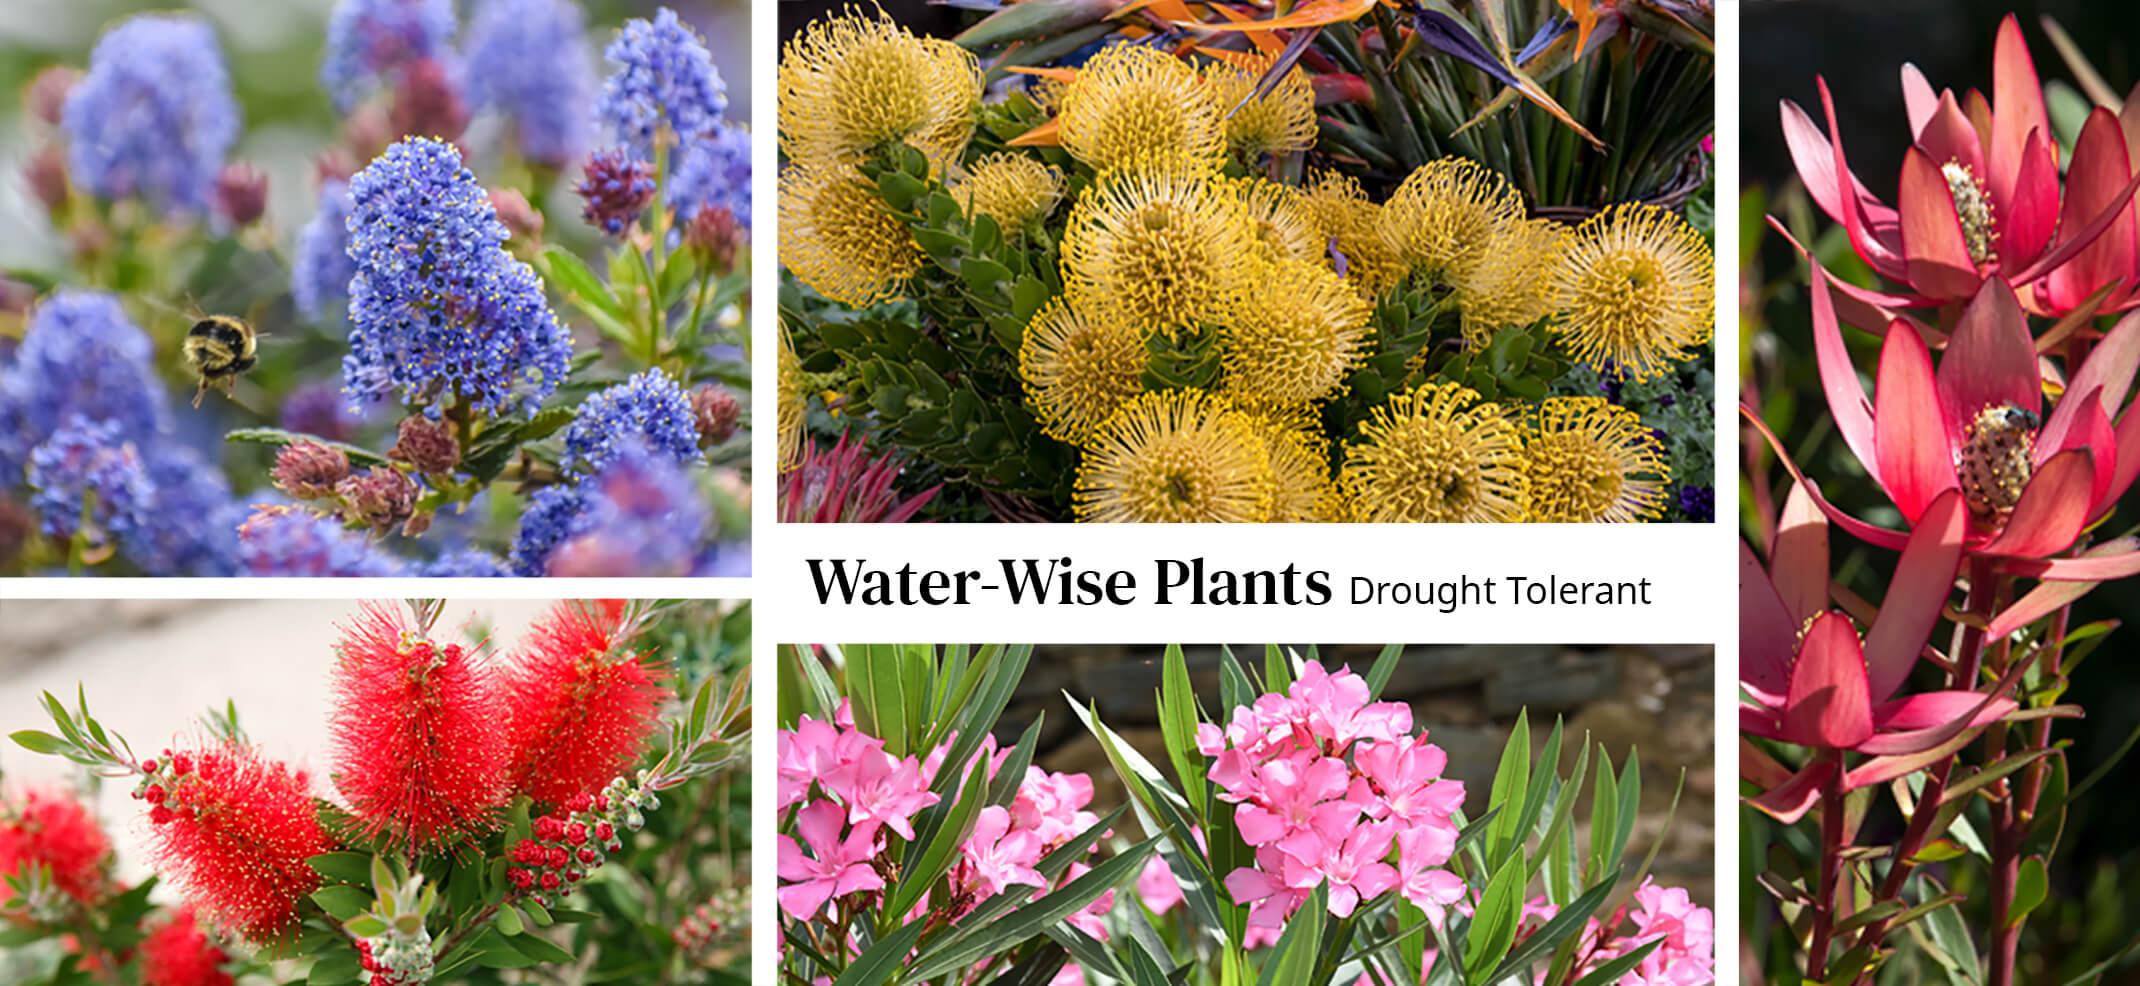 Assorted Perennials water-wise drought tolerant - ceanothus, pincushion, leucadendron, bottlebrush, oleander